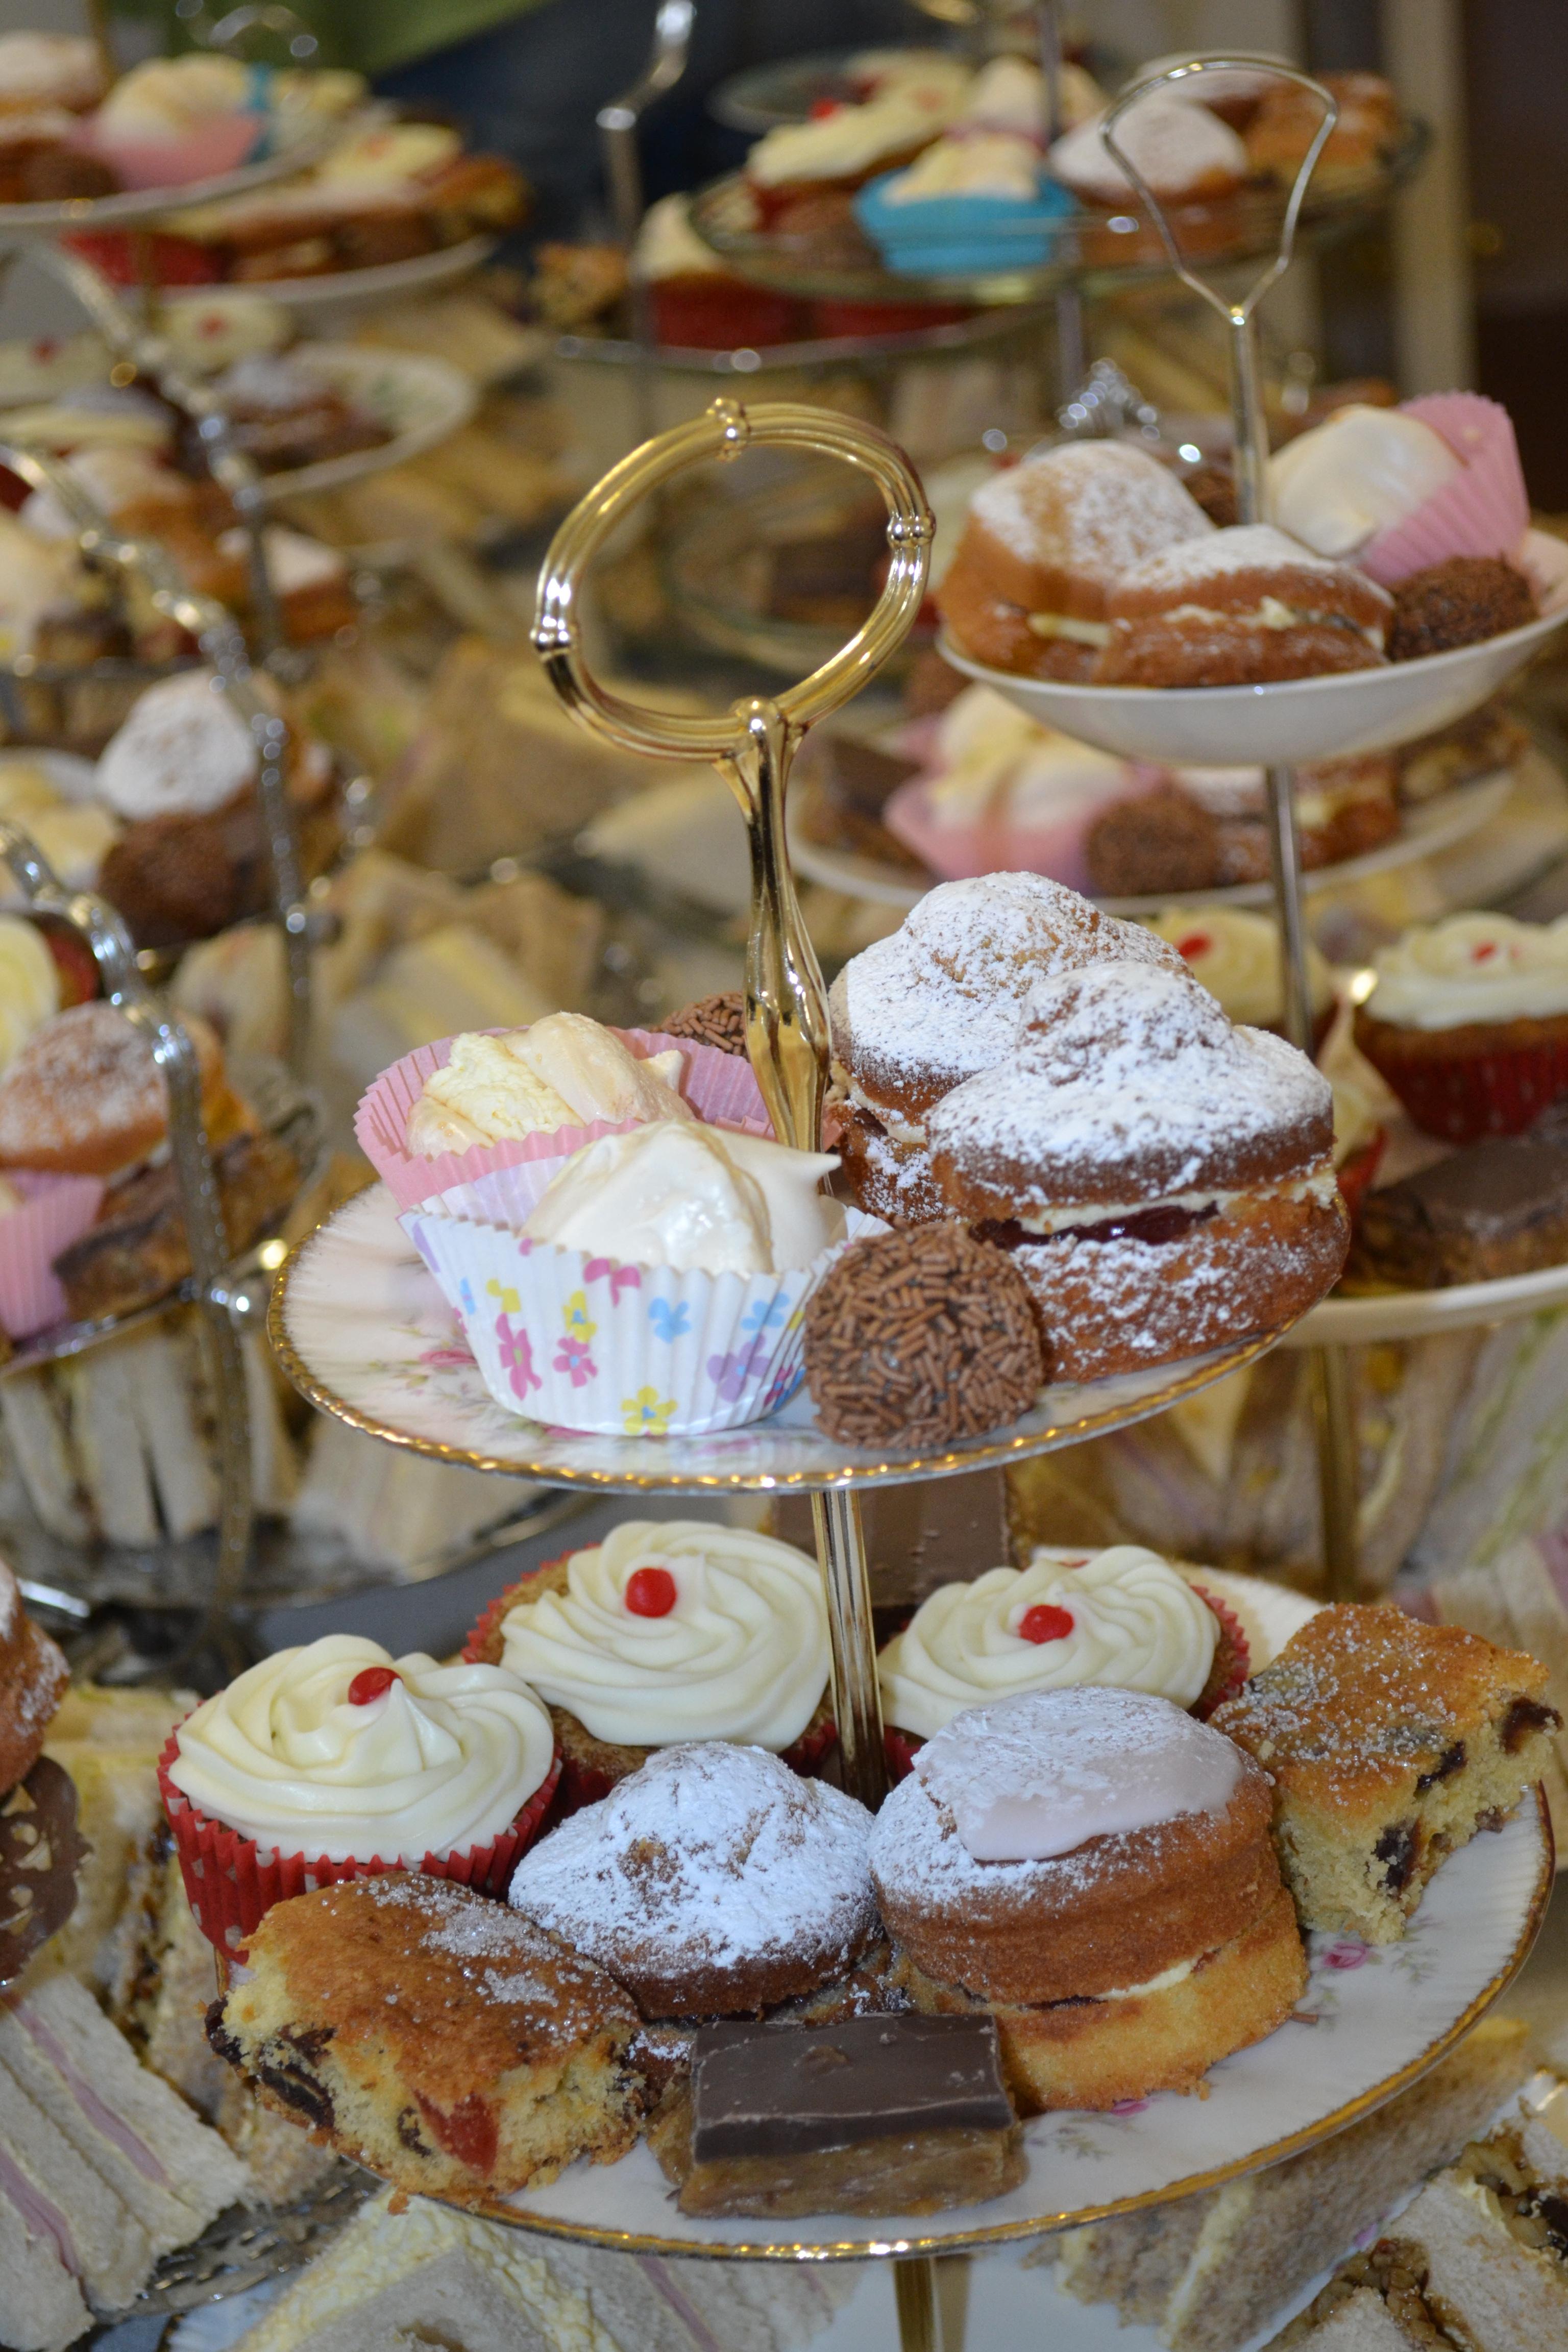 Cake Sale - Sunday 29th November